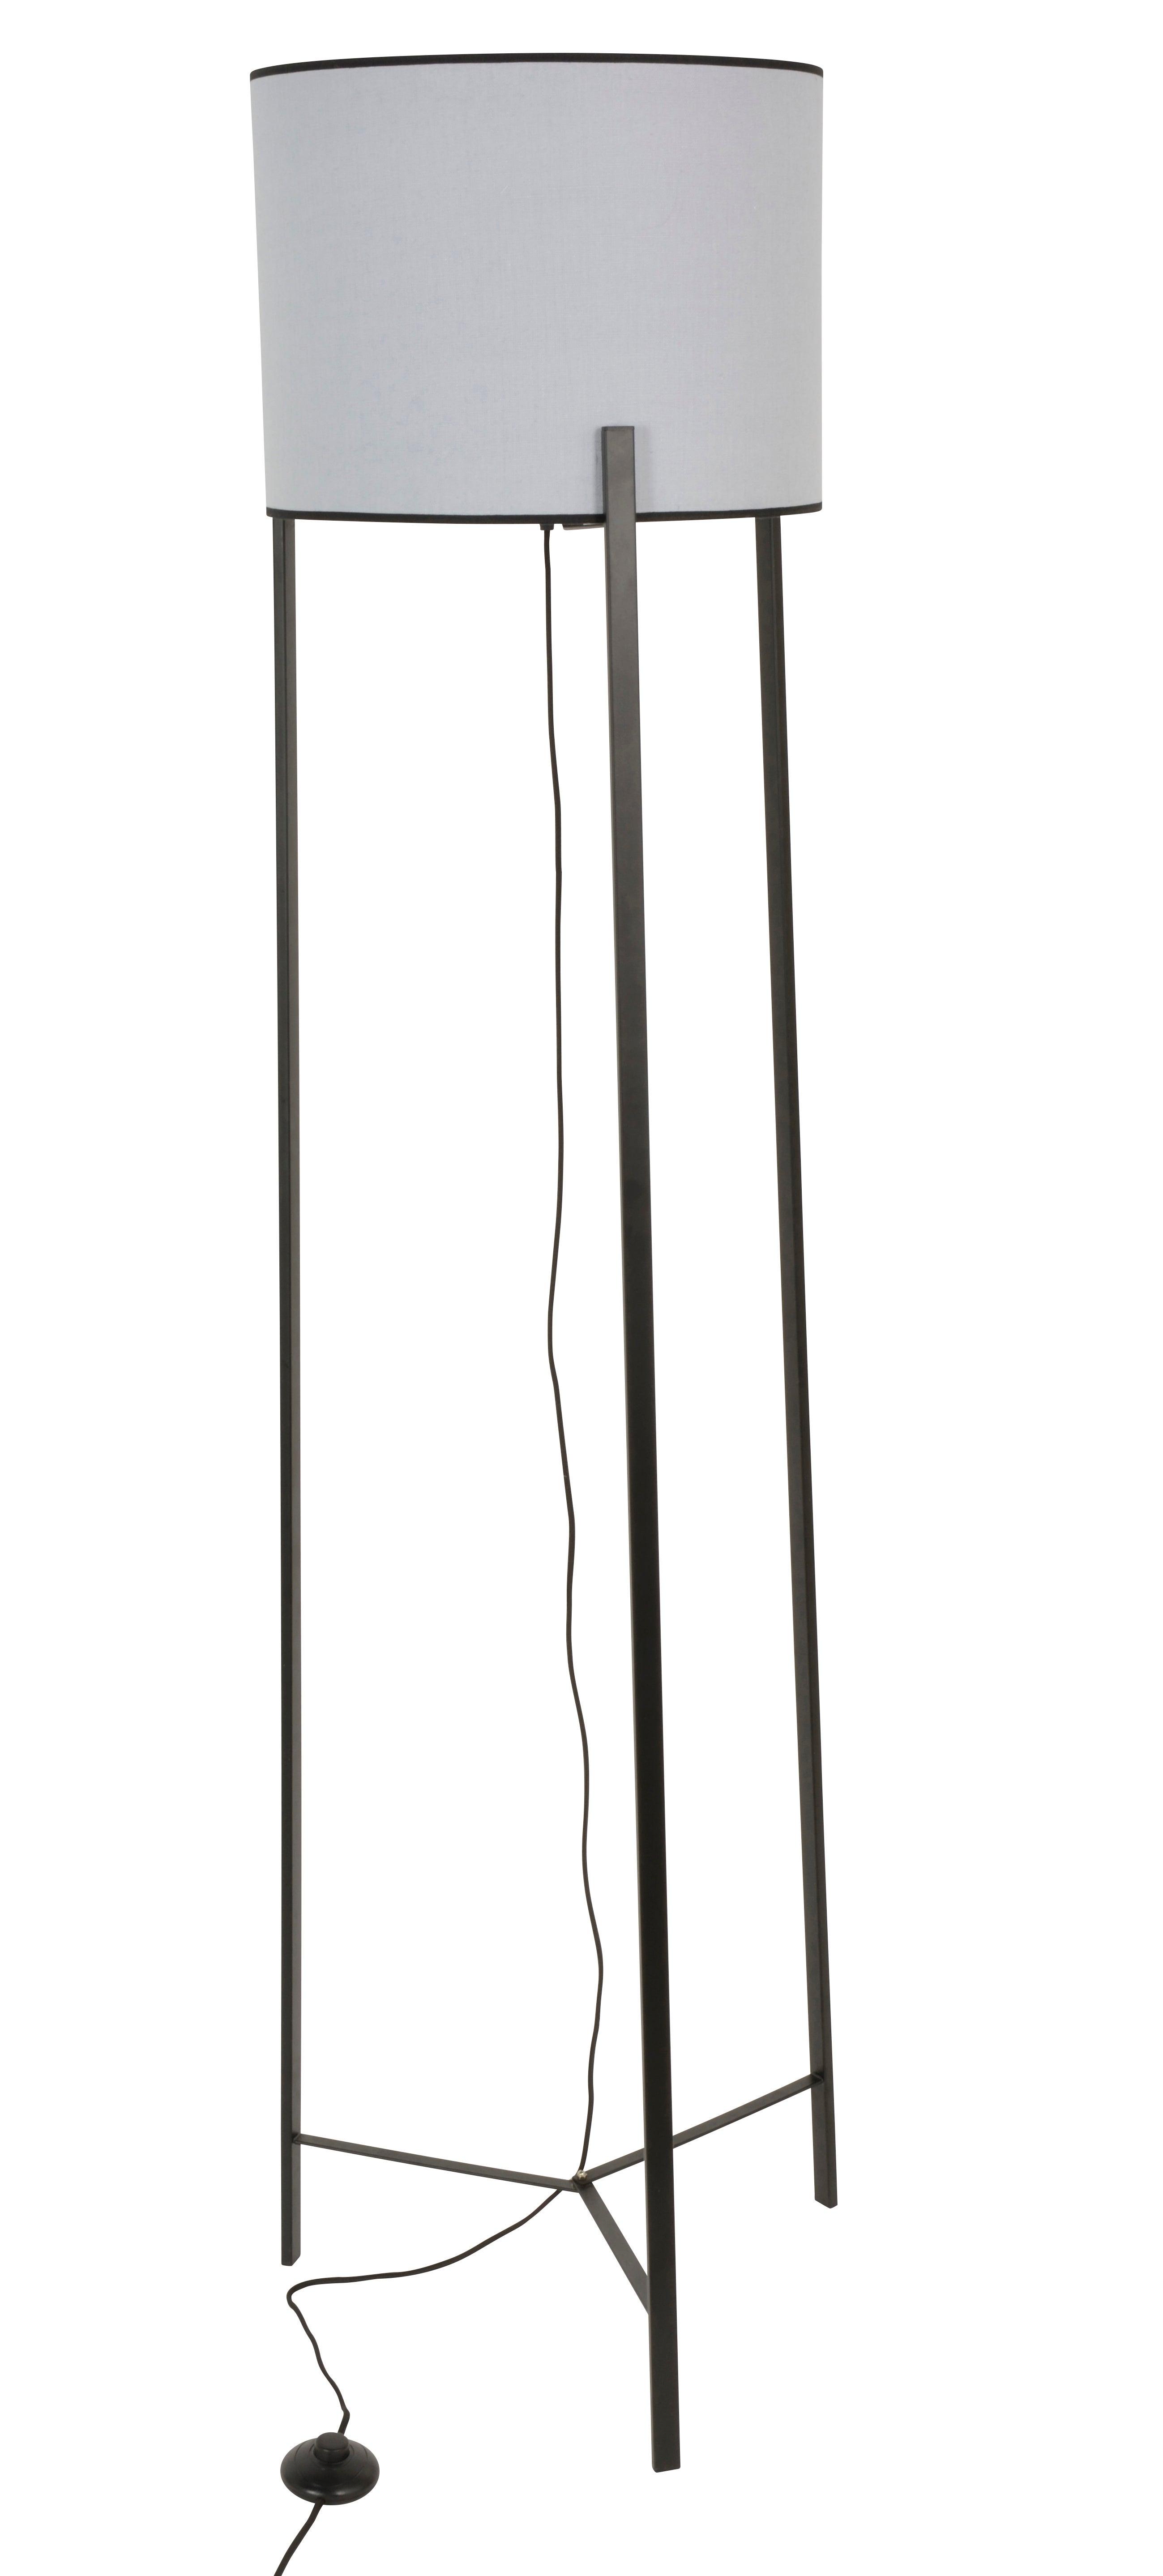 Lampadaire trépied métal JOSHUA | Leroy Merlin